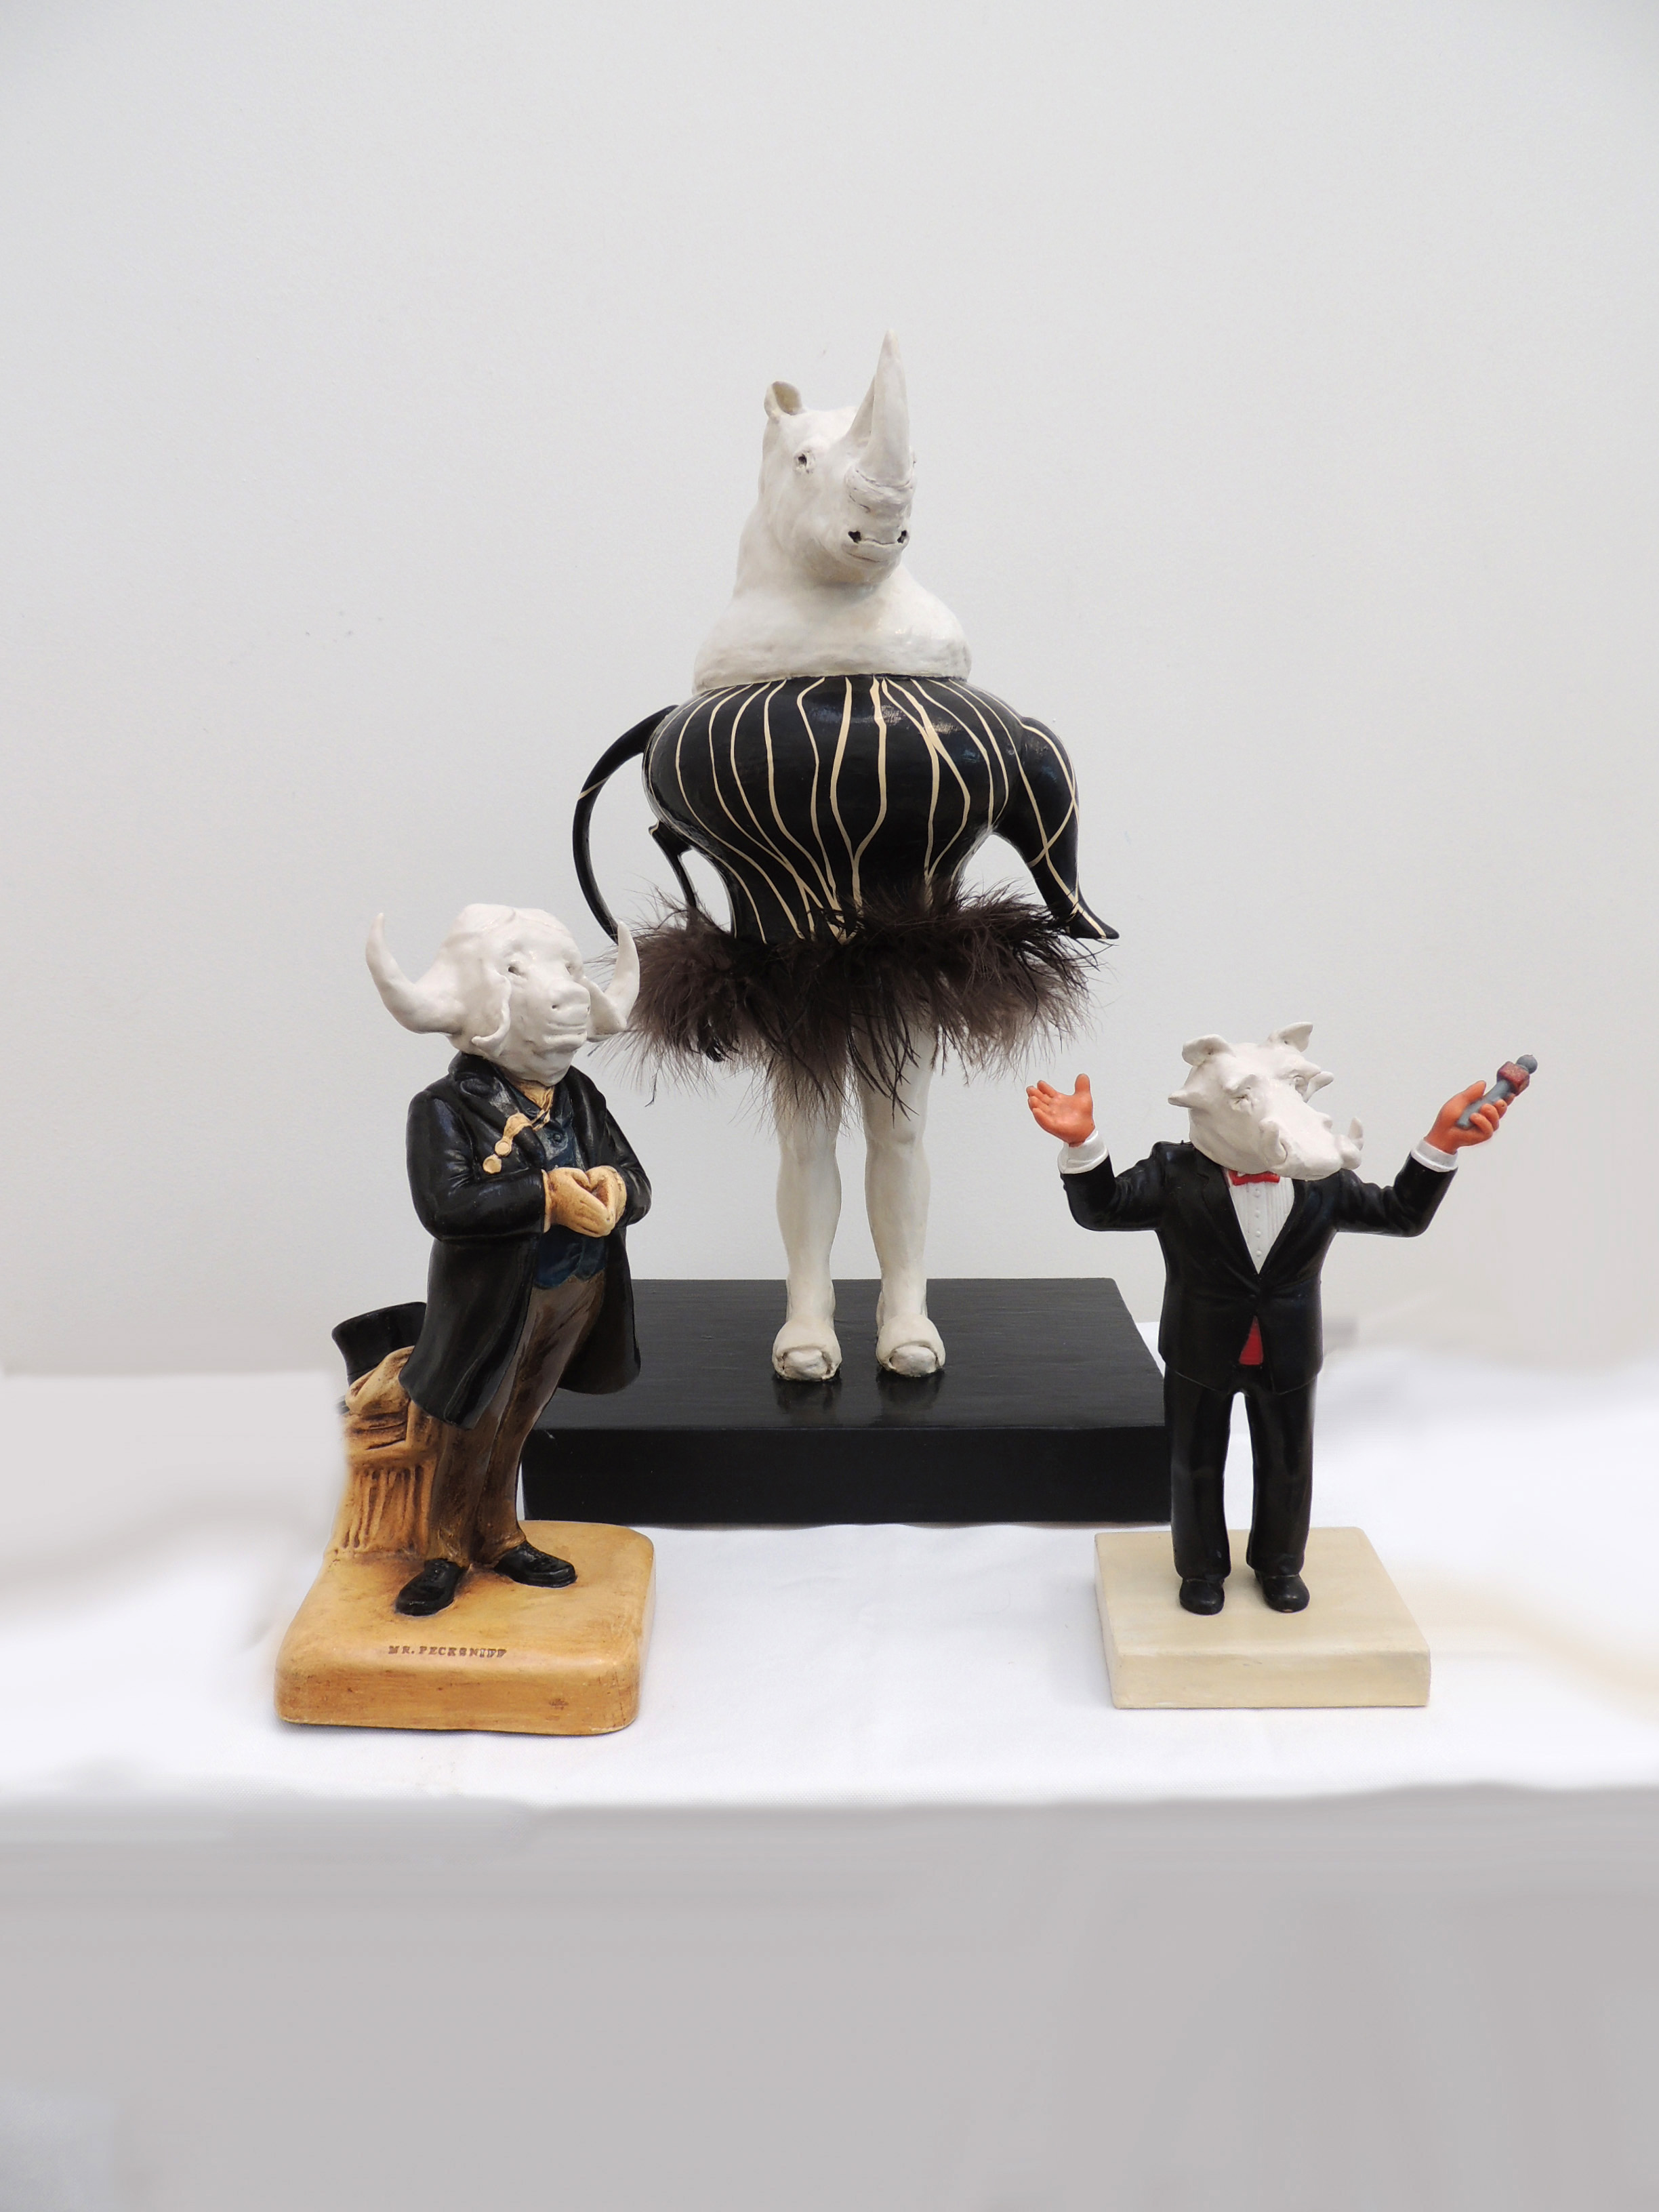 Sue Boettcher South Australian Contemporary Artist living in Adelaide